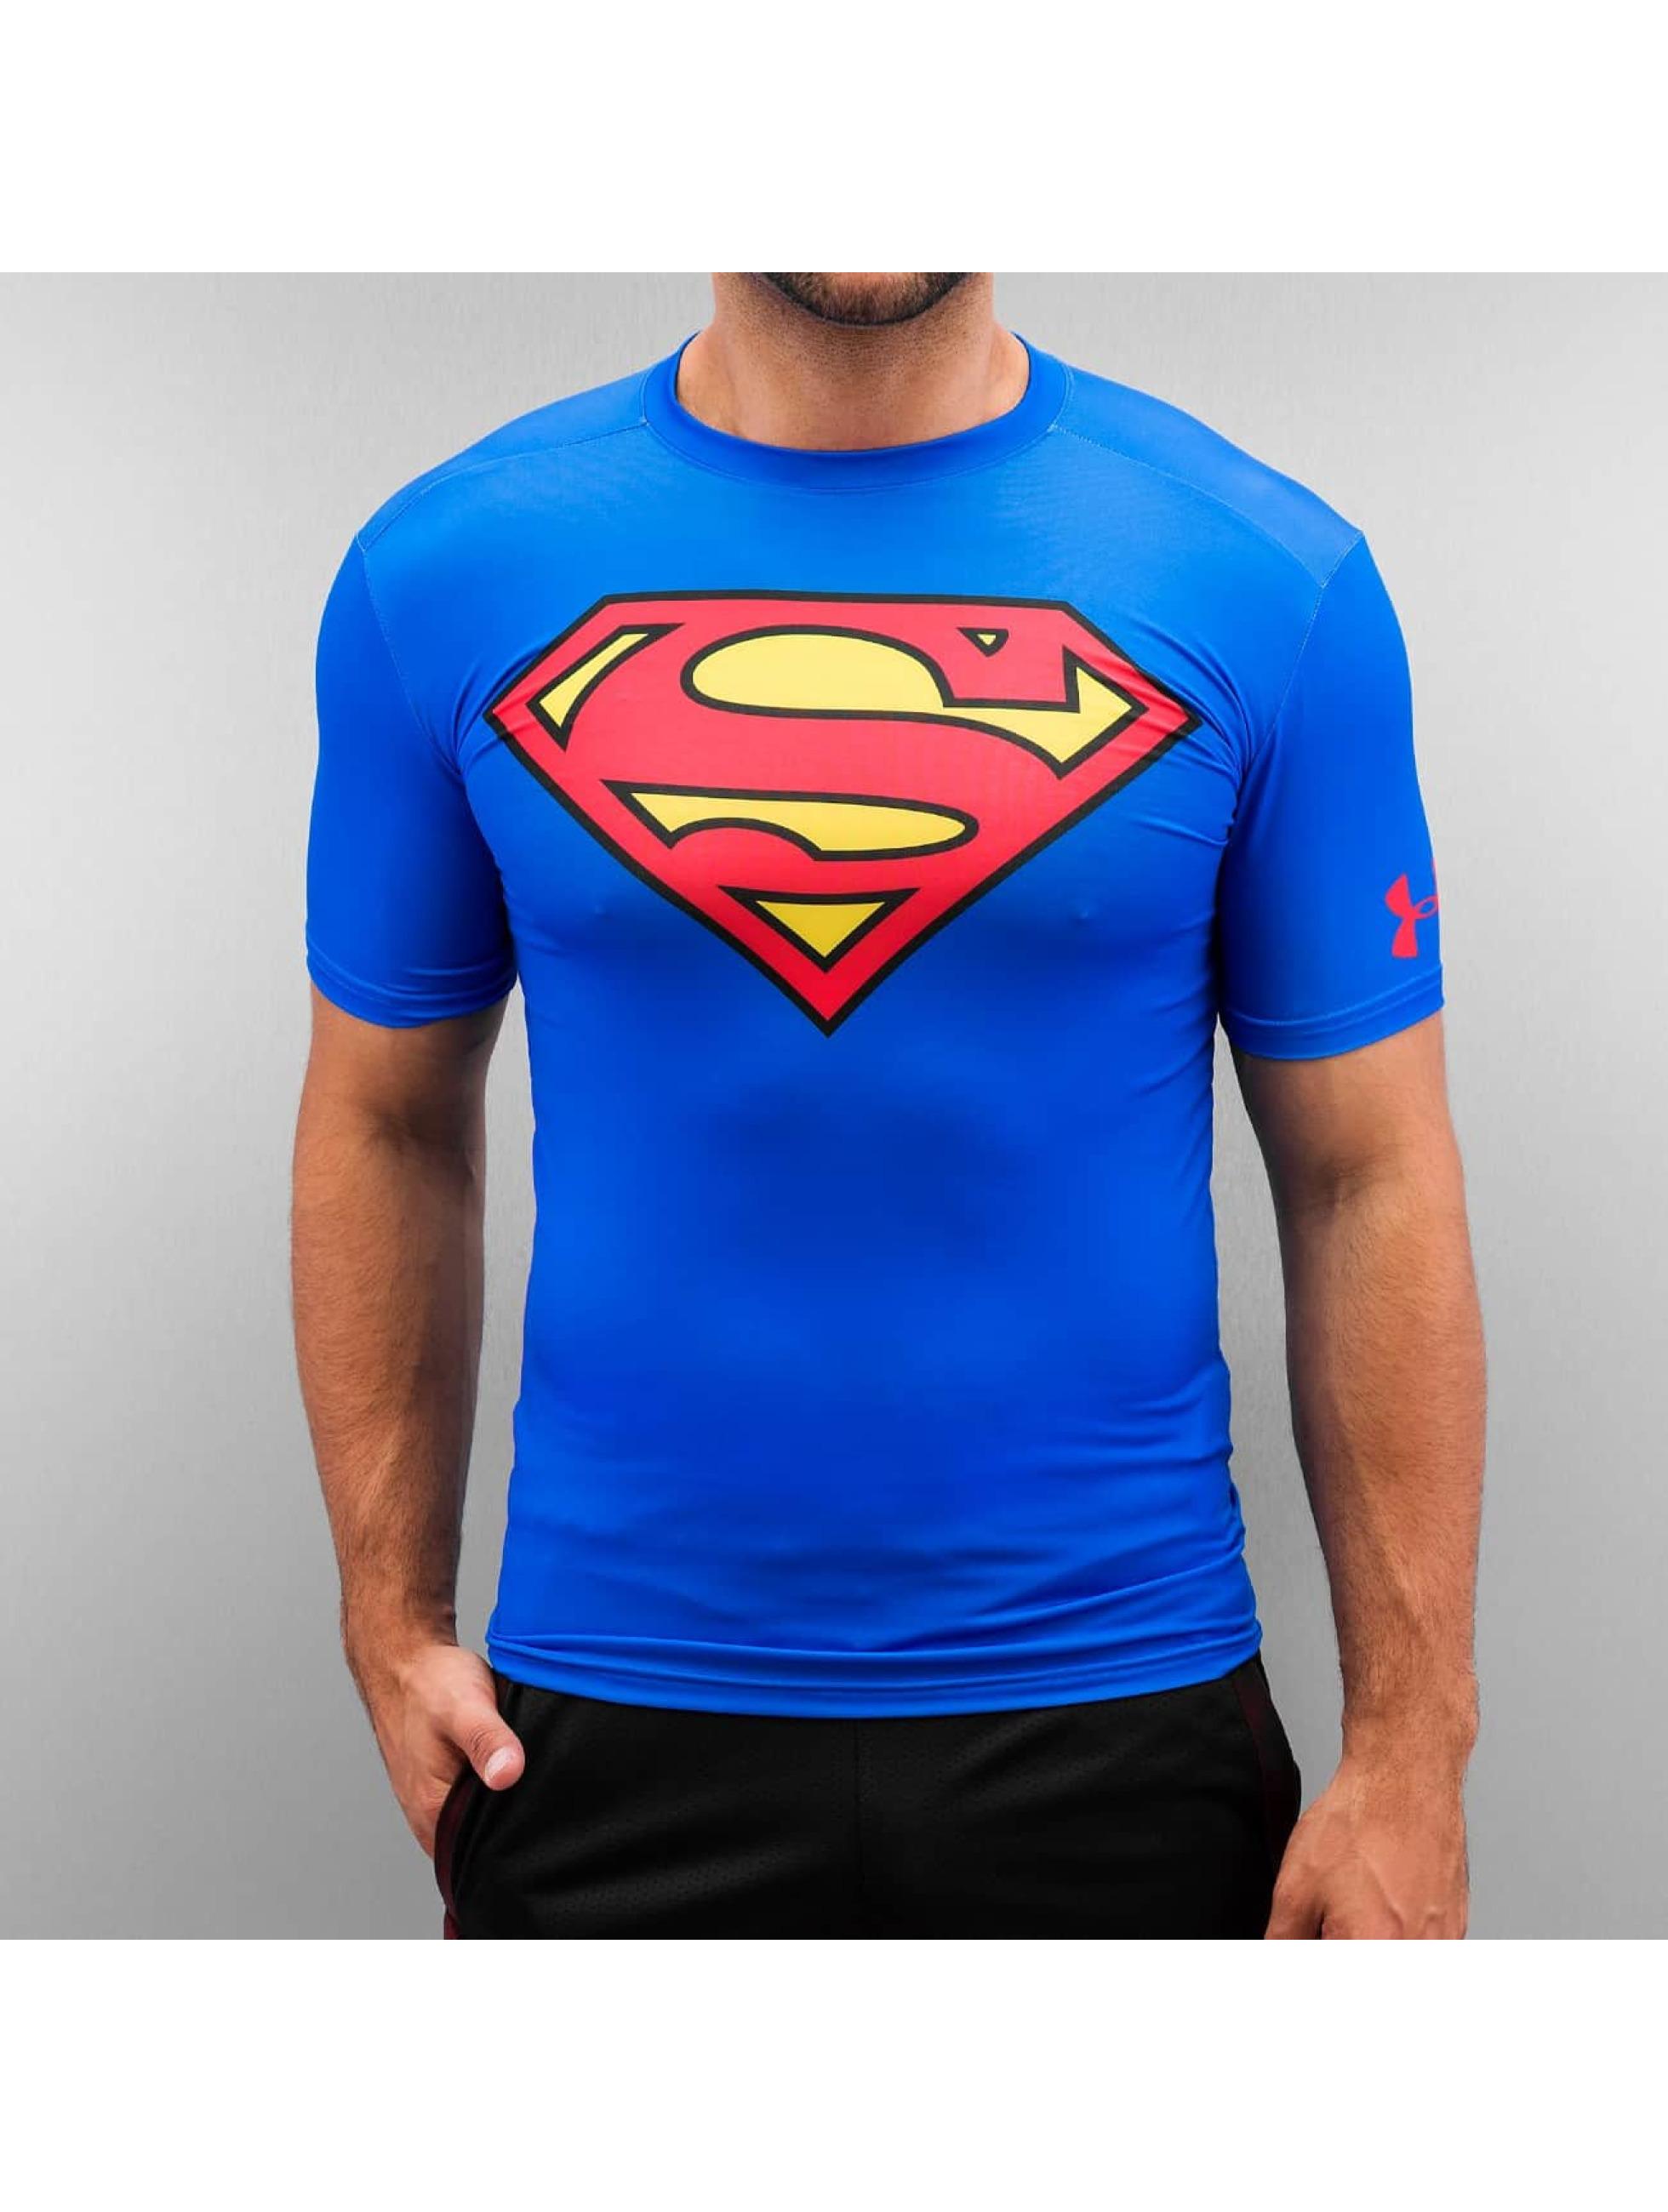 Under Armour t-shirt Alter Ego Superman Compression blauw